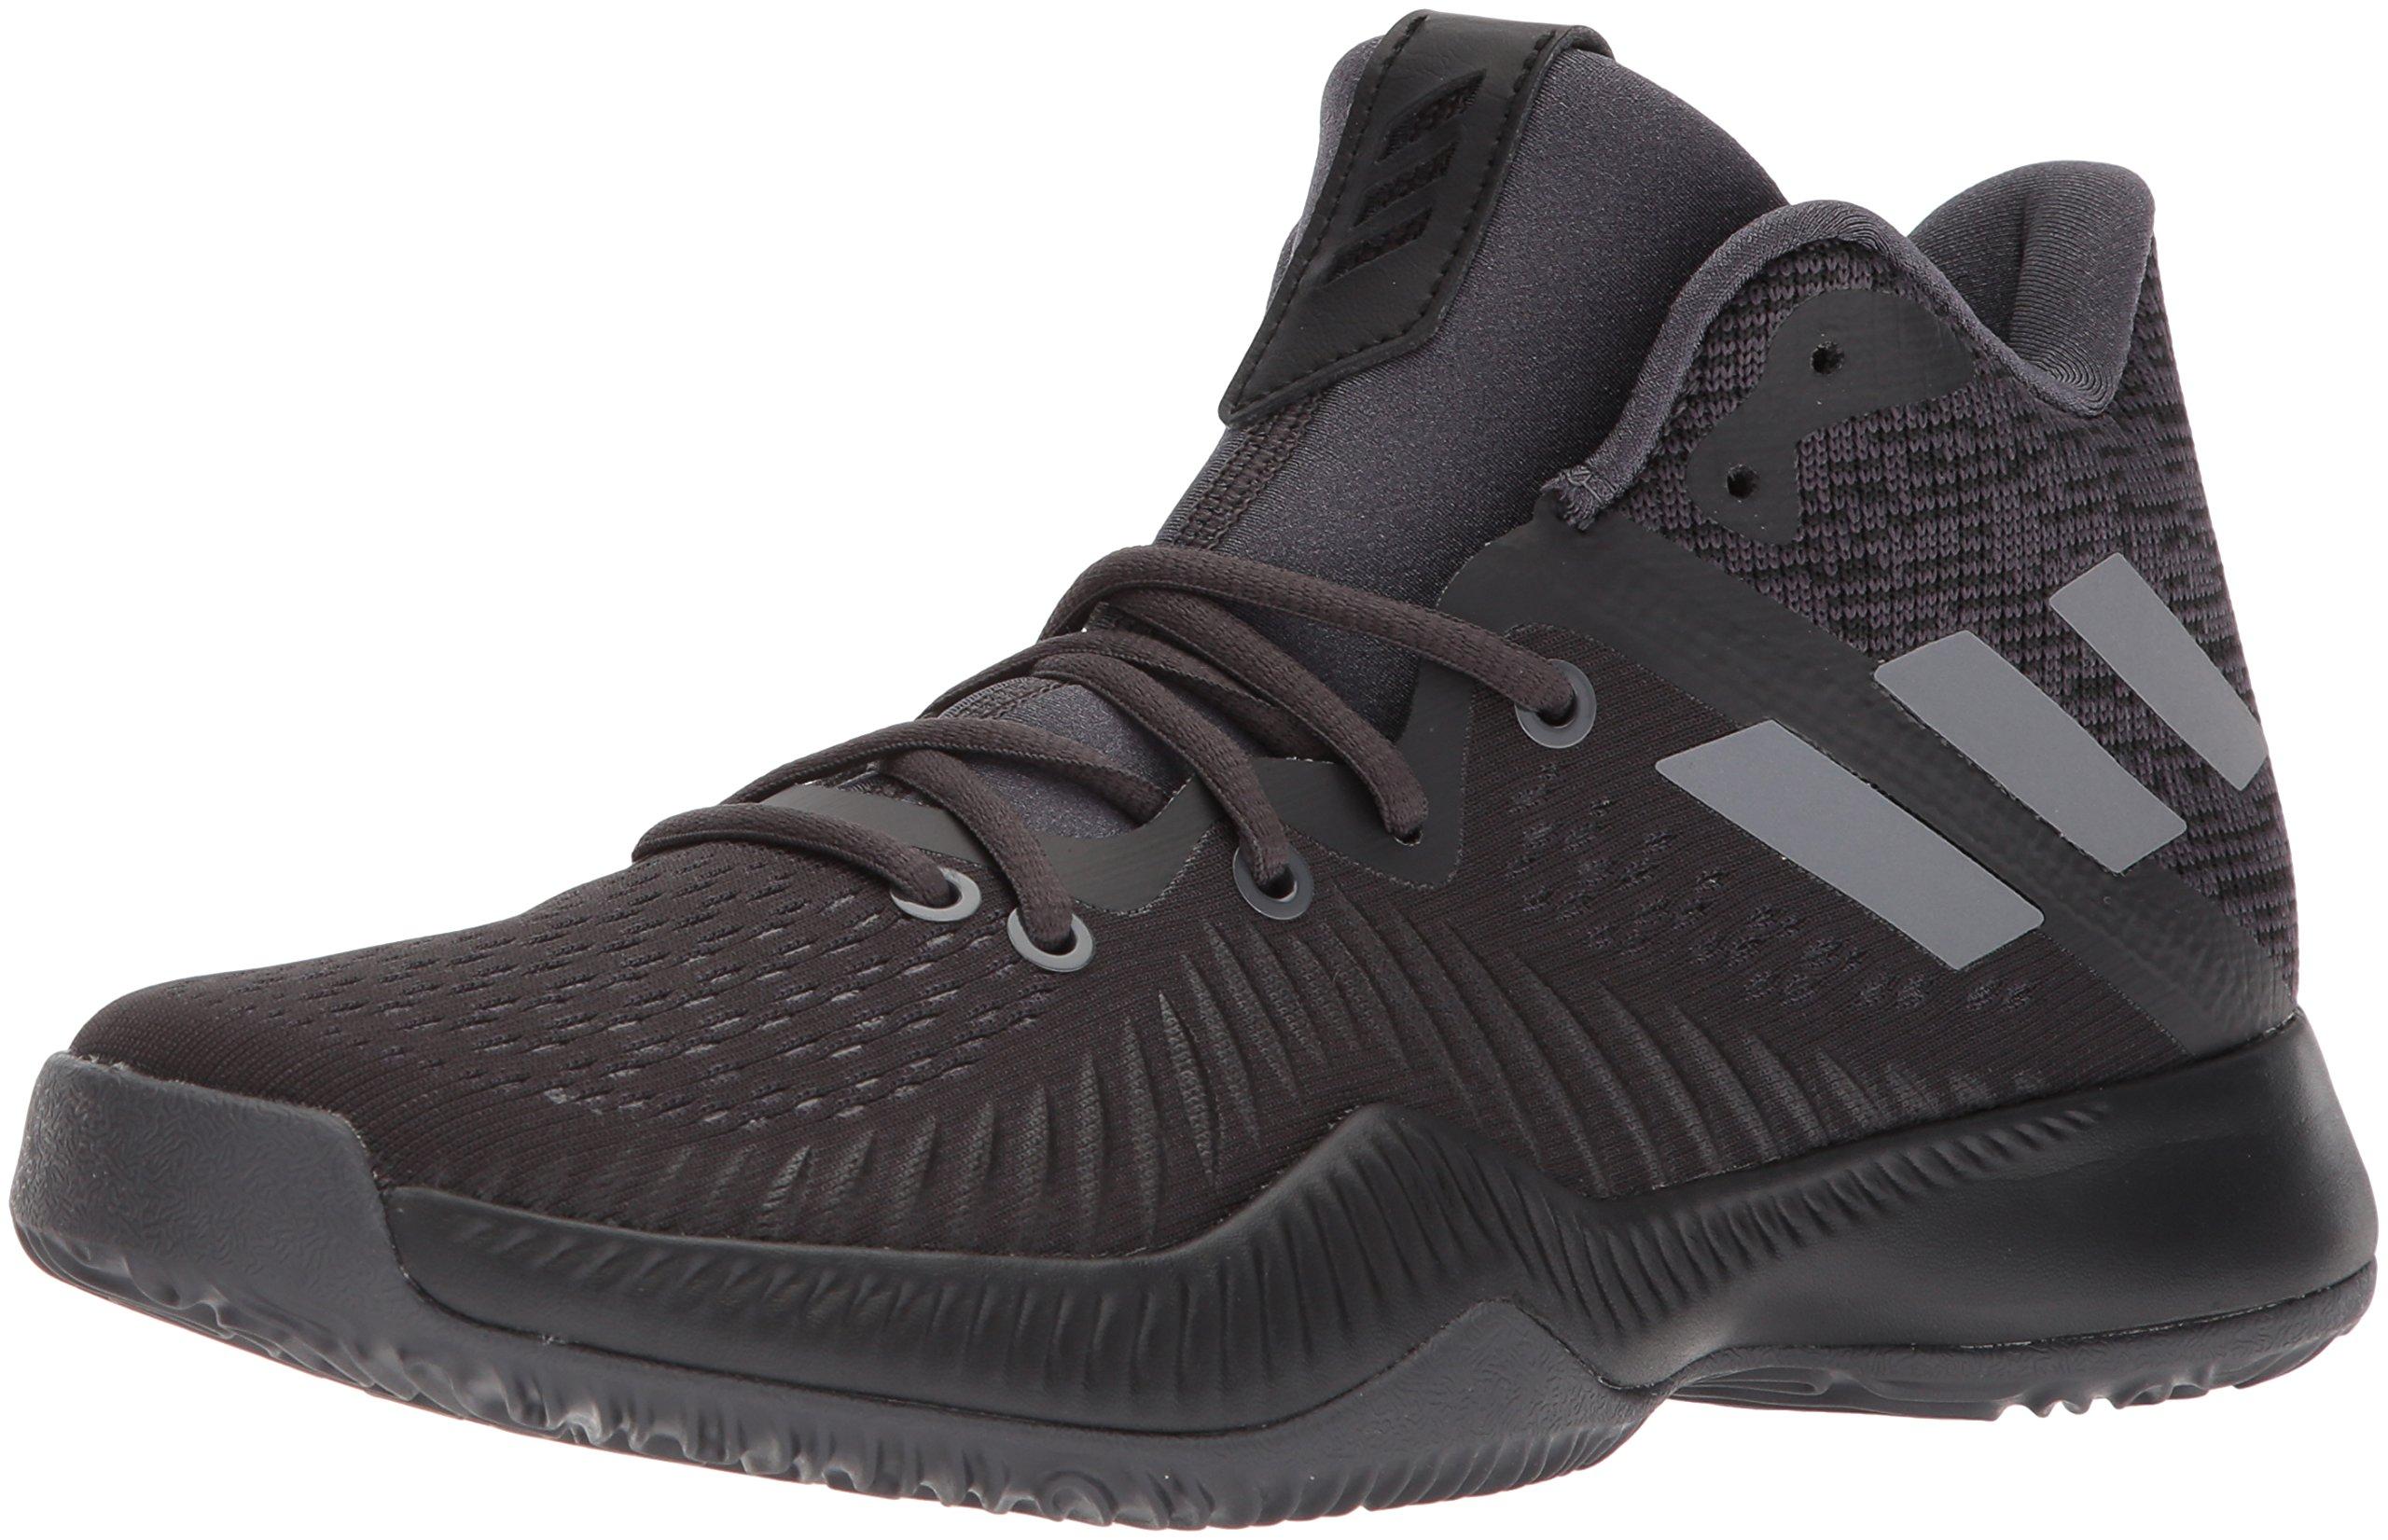 adidas Performance Men's Mad Bounce Basketball Shoe, Utility Black/Core Black/Grey Four, 11 M US